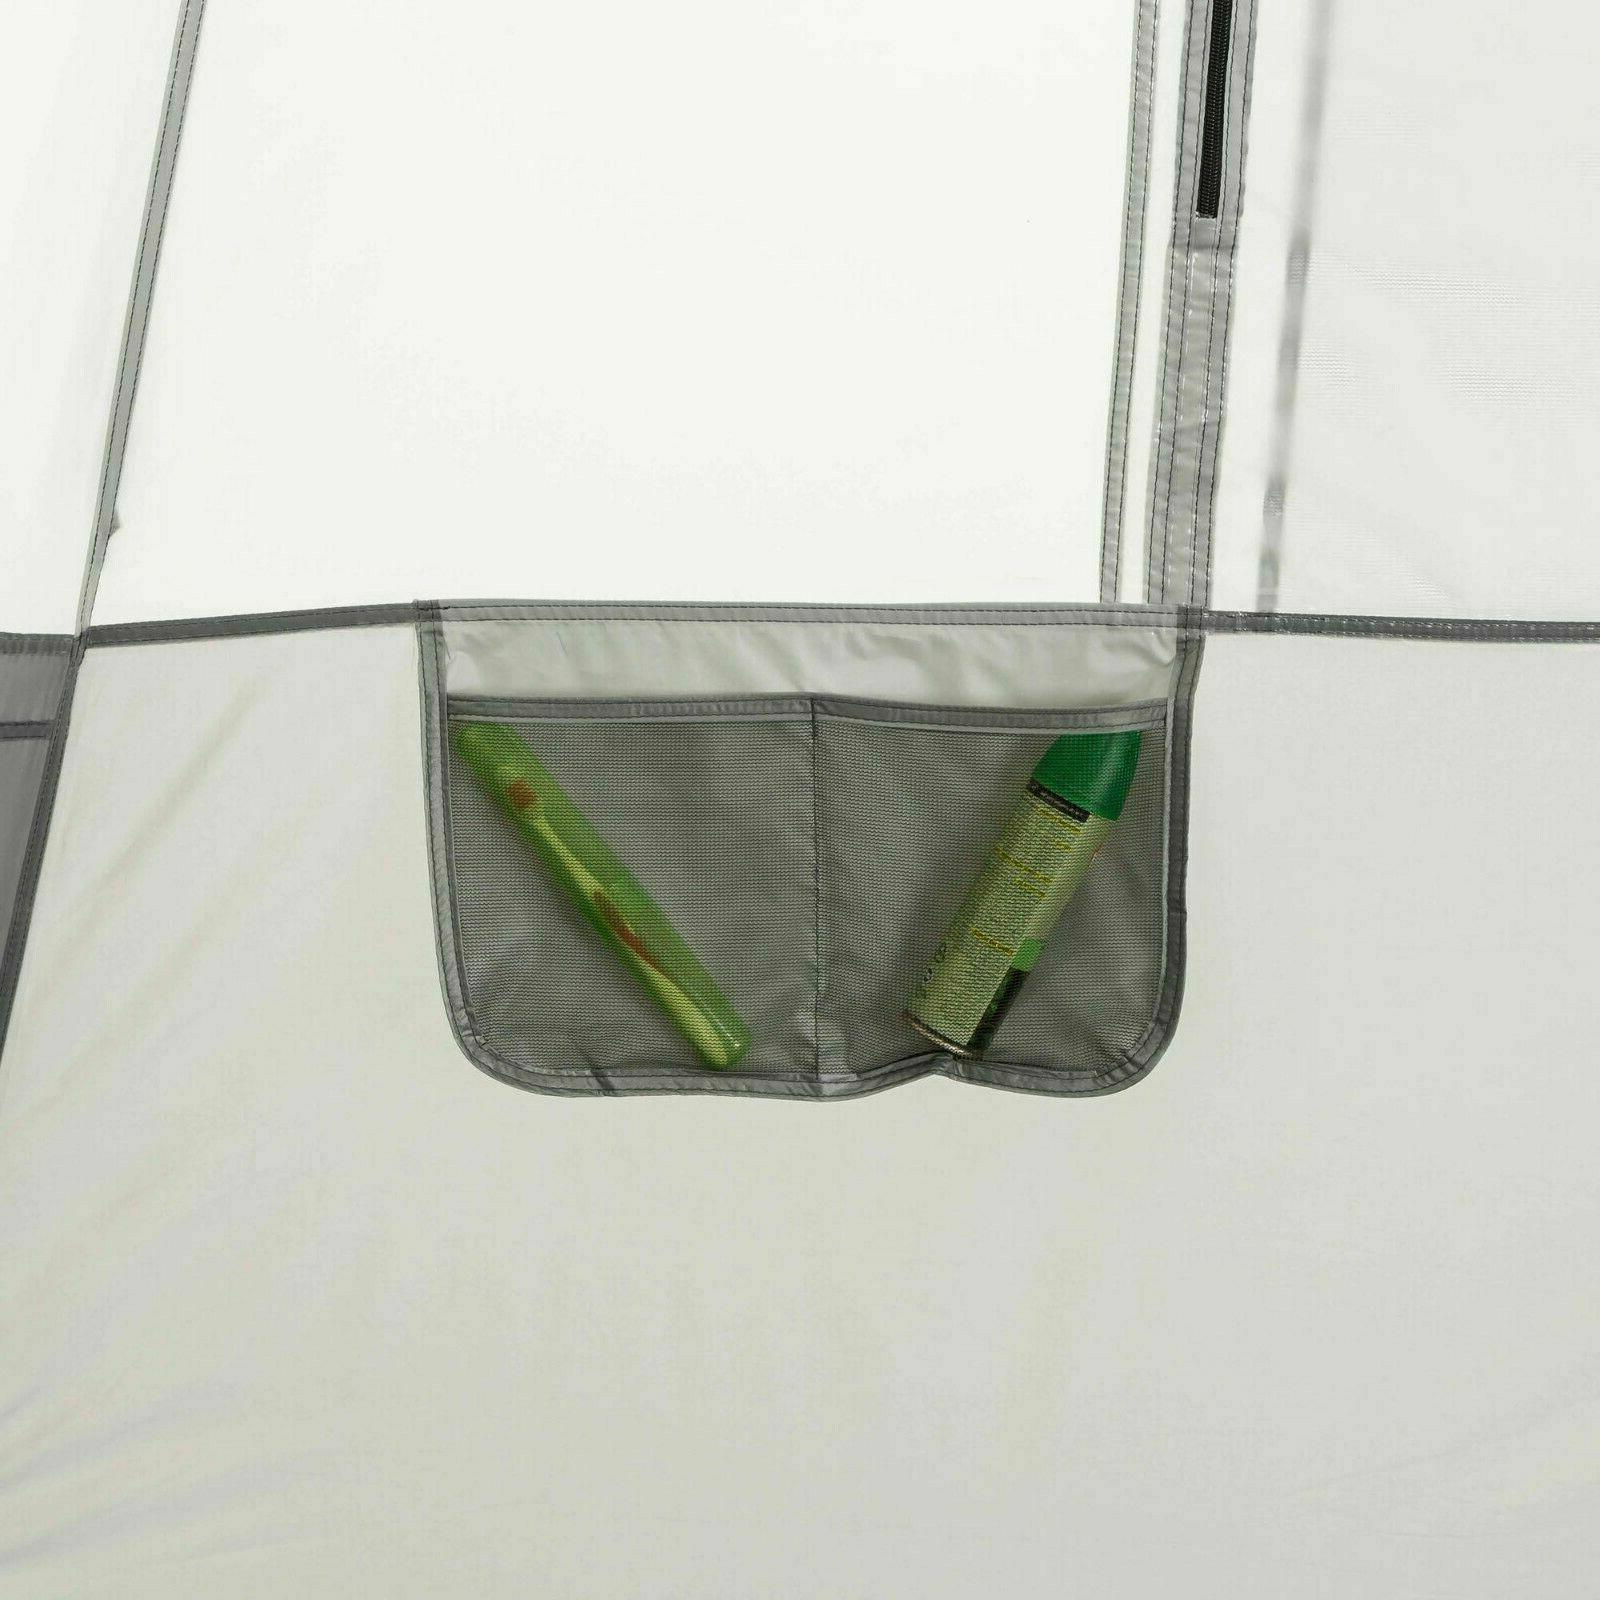 Instant Cabin Set Pop 8 Outdoor Shelter Tents